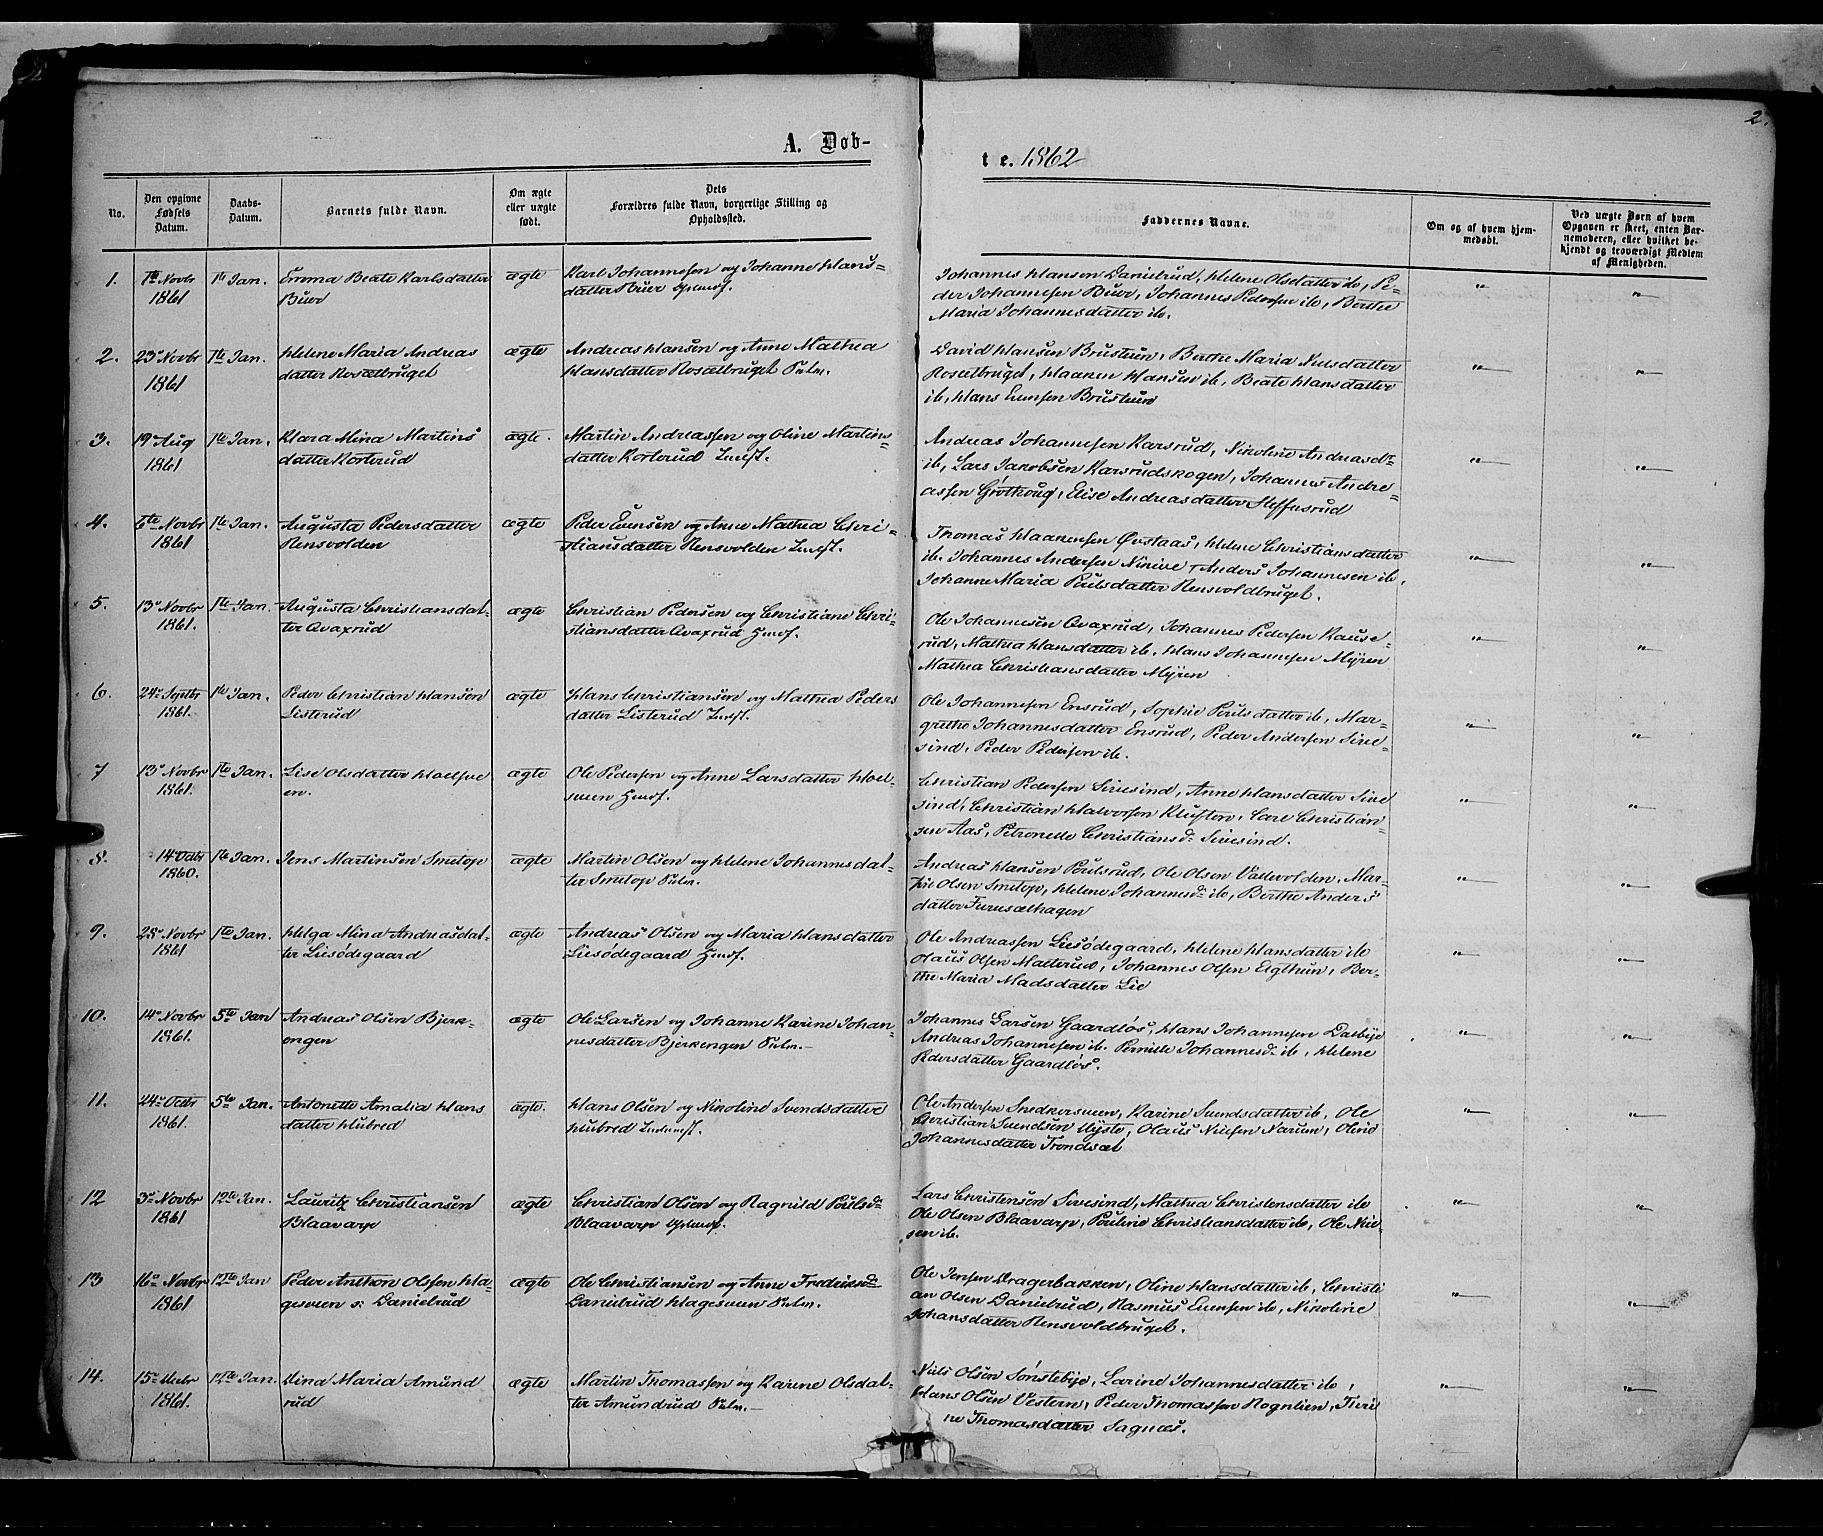 SAH, Vestre Toten prestekontor, H/Ha/Haa/L0007: Ministerialbok nr. 7, 1862-1869, s. 2